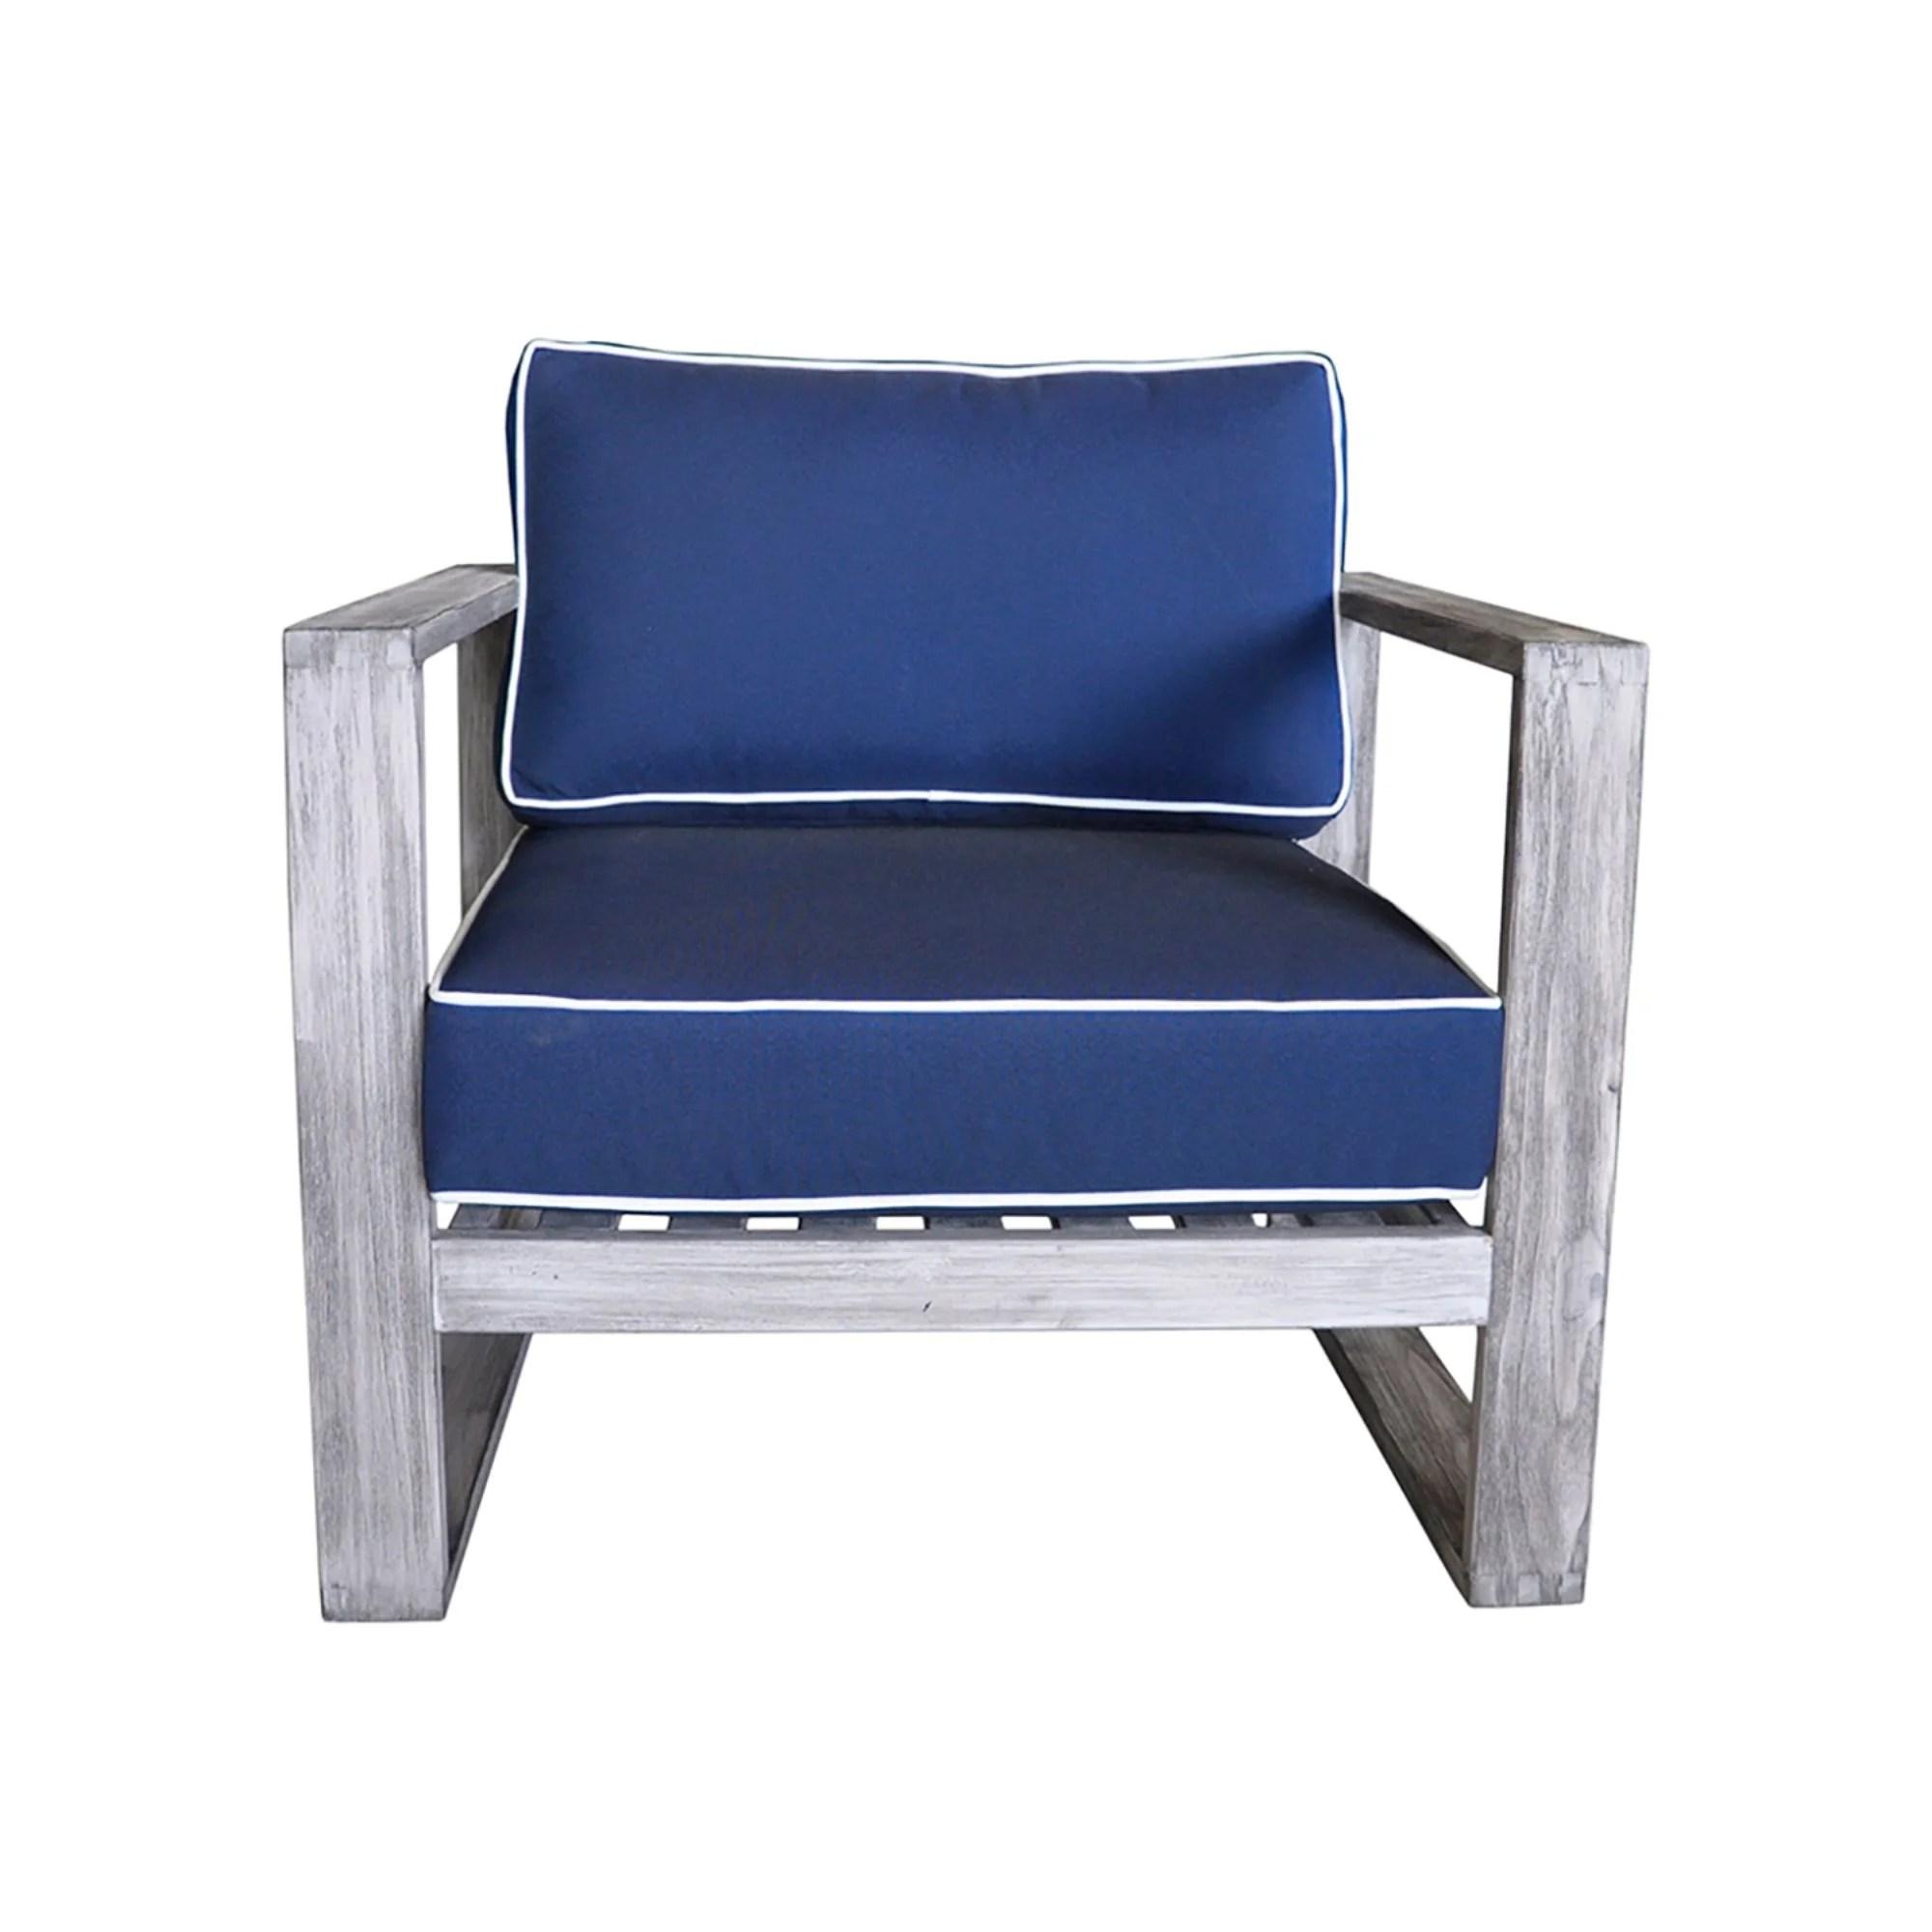 asther modern outdoor teak patio chair with sunbrella cushions